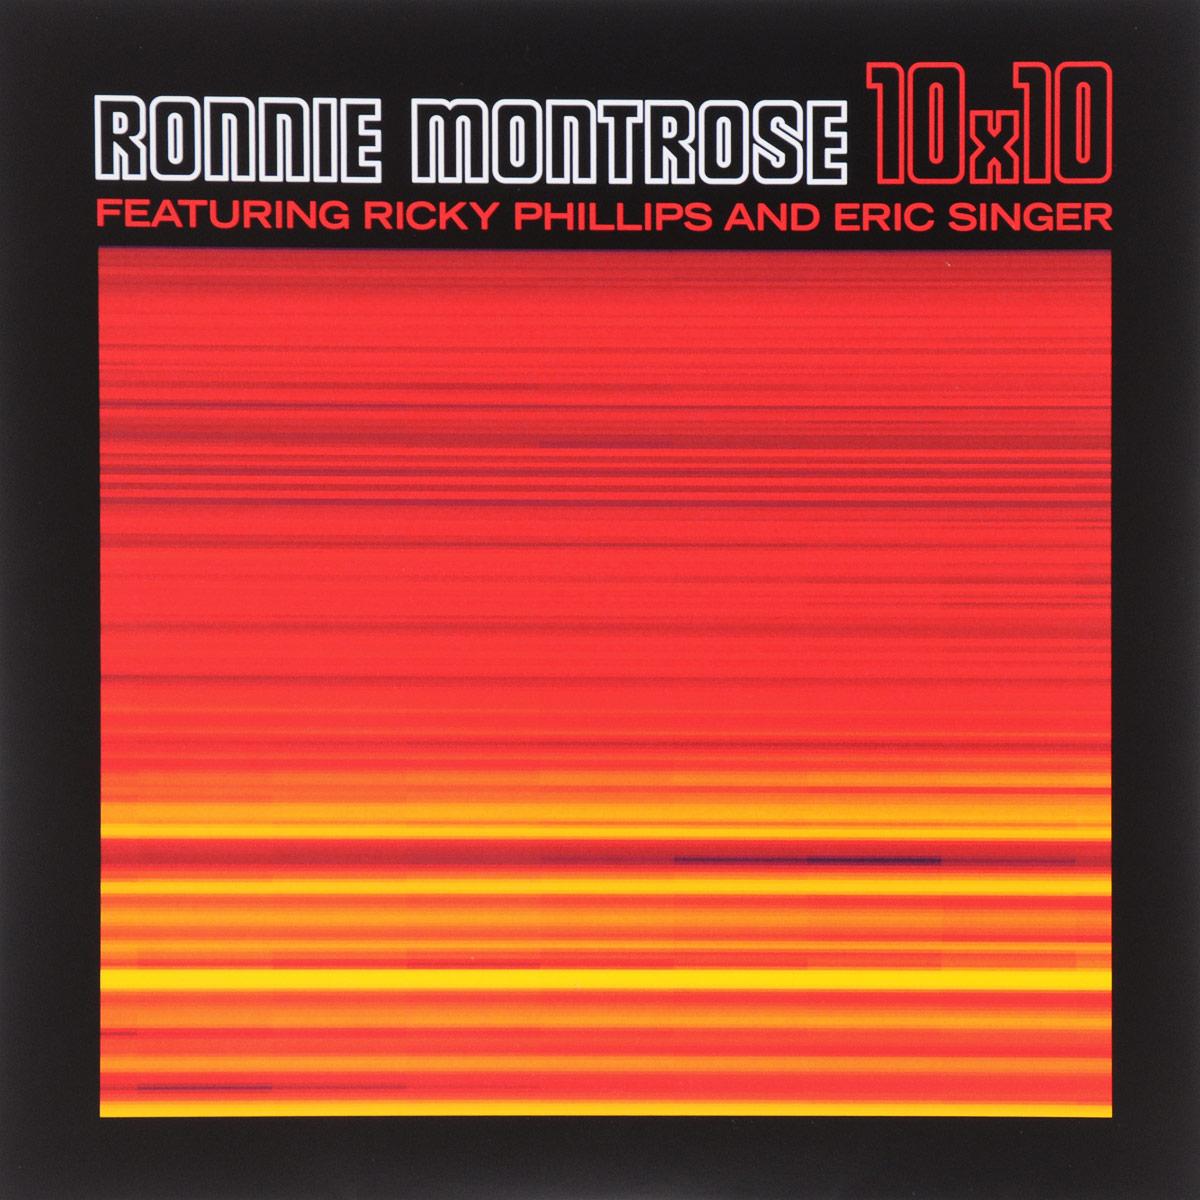 Ронни Монтроуз Ronnie Montrose. 10x10 (LP) montrose montrose montrose 2 lp page 6 page 5